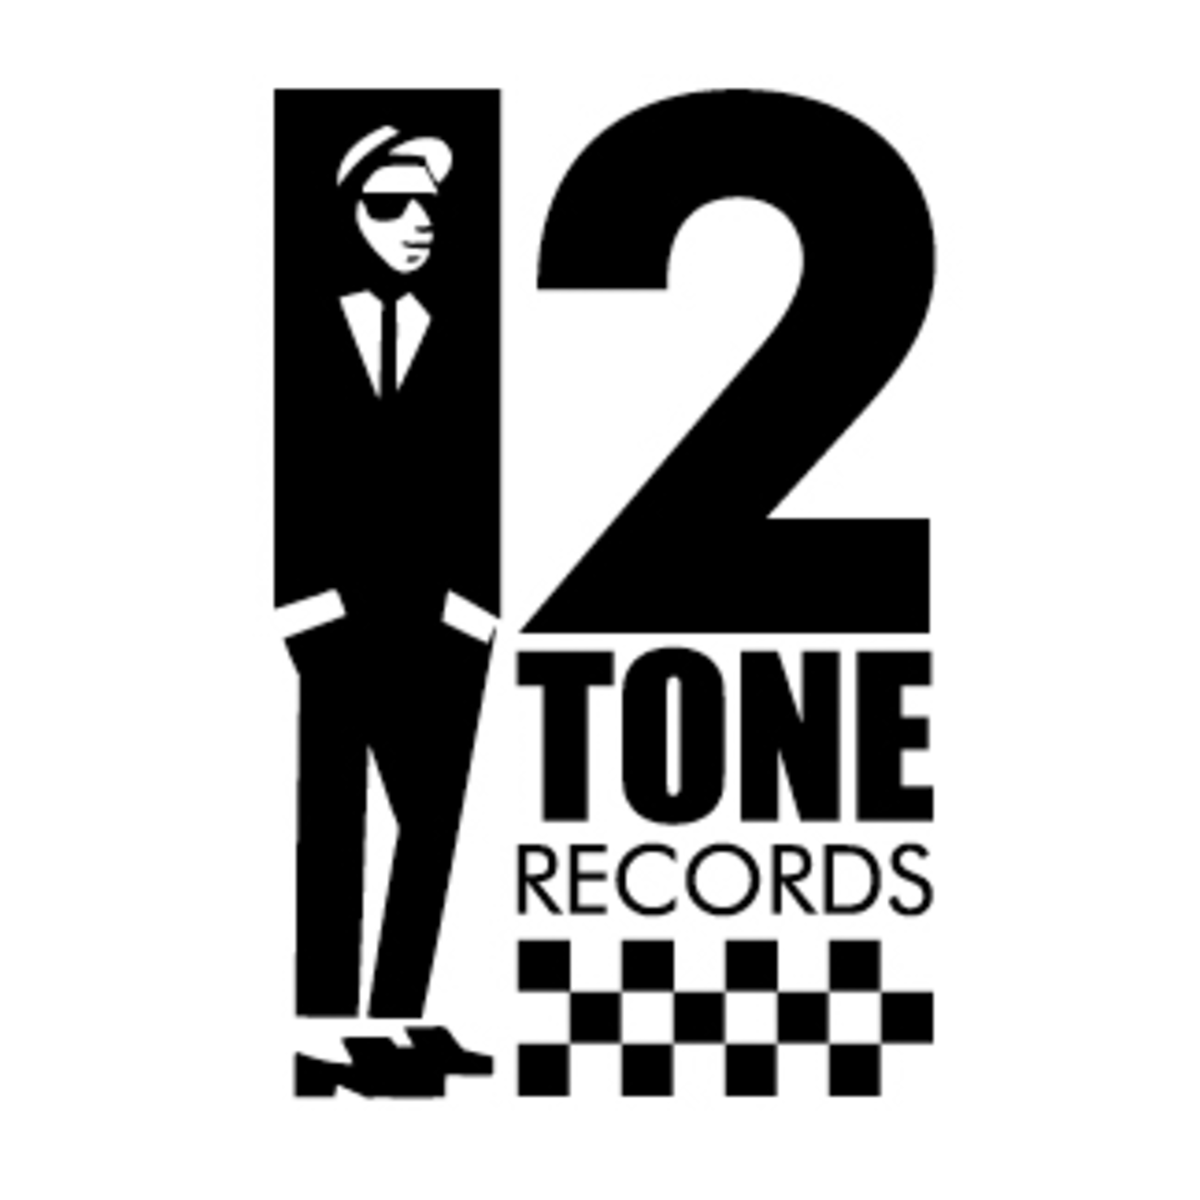 two Tone records logo